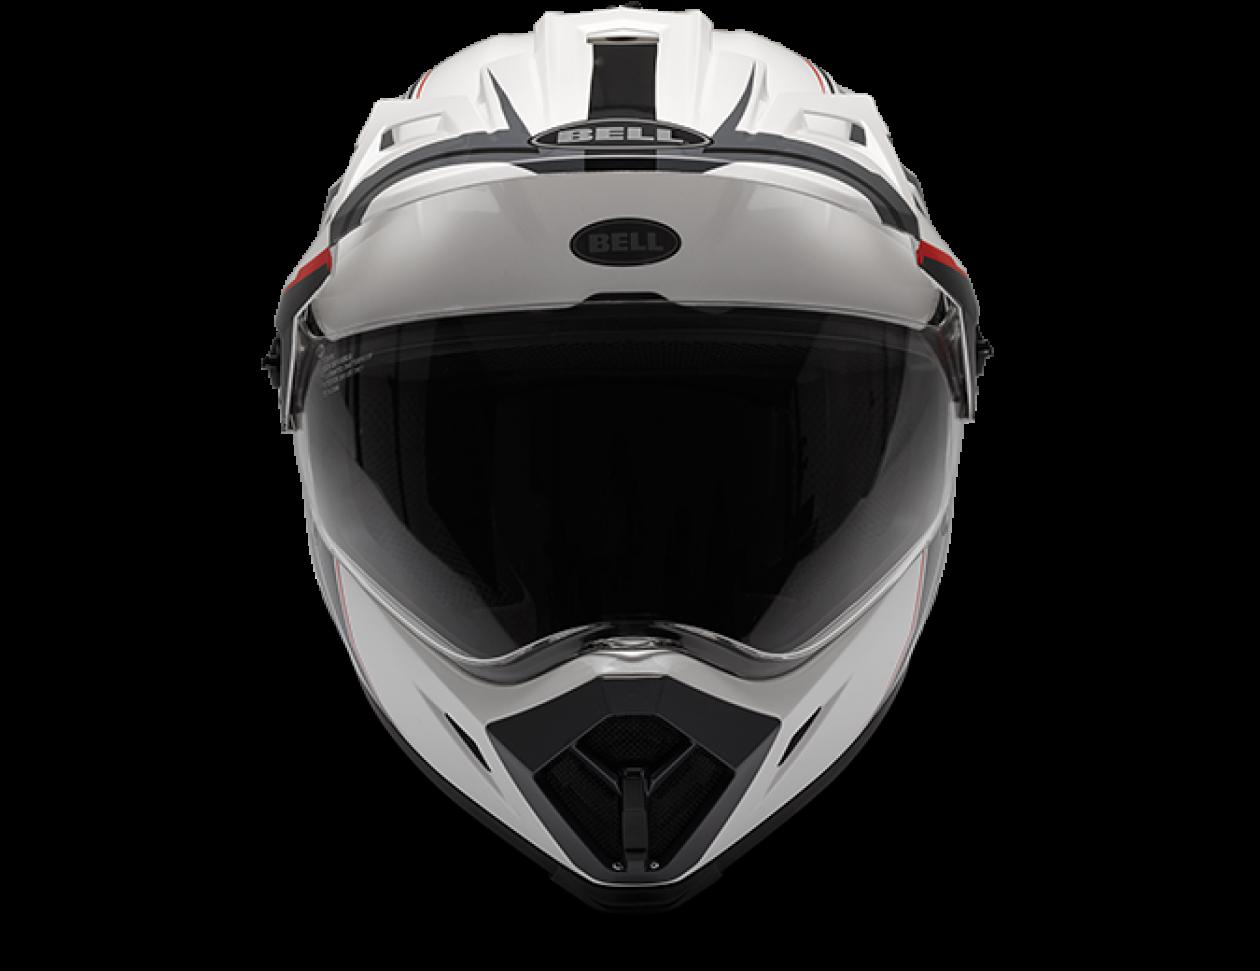 Motorcycle Helmet PNG Images Transparent Free Download.